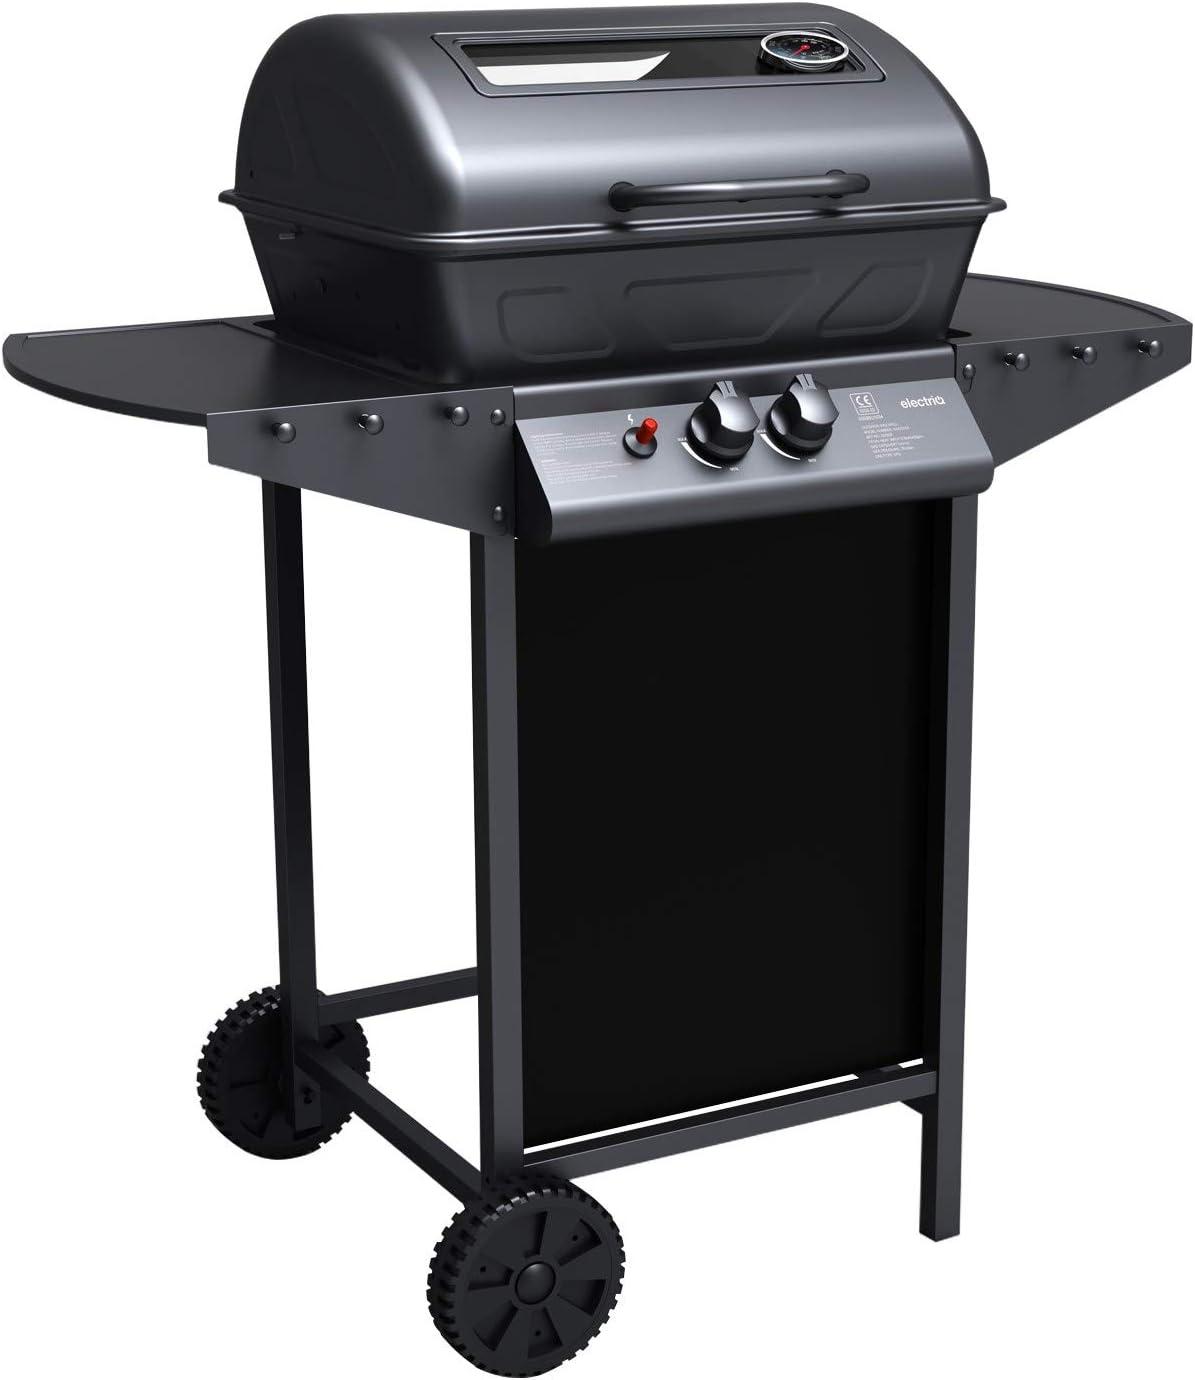 New for 2020! Louisiana 2 Burner Gas BBQ